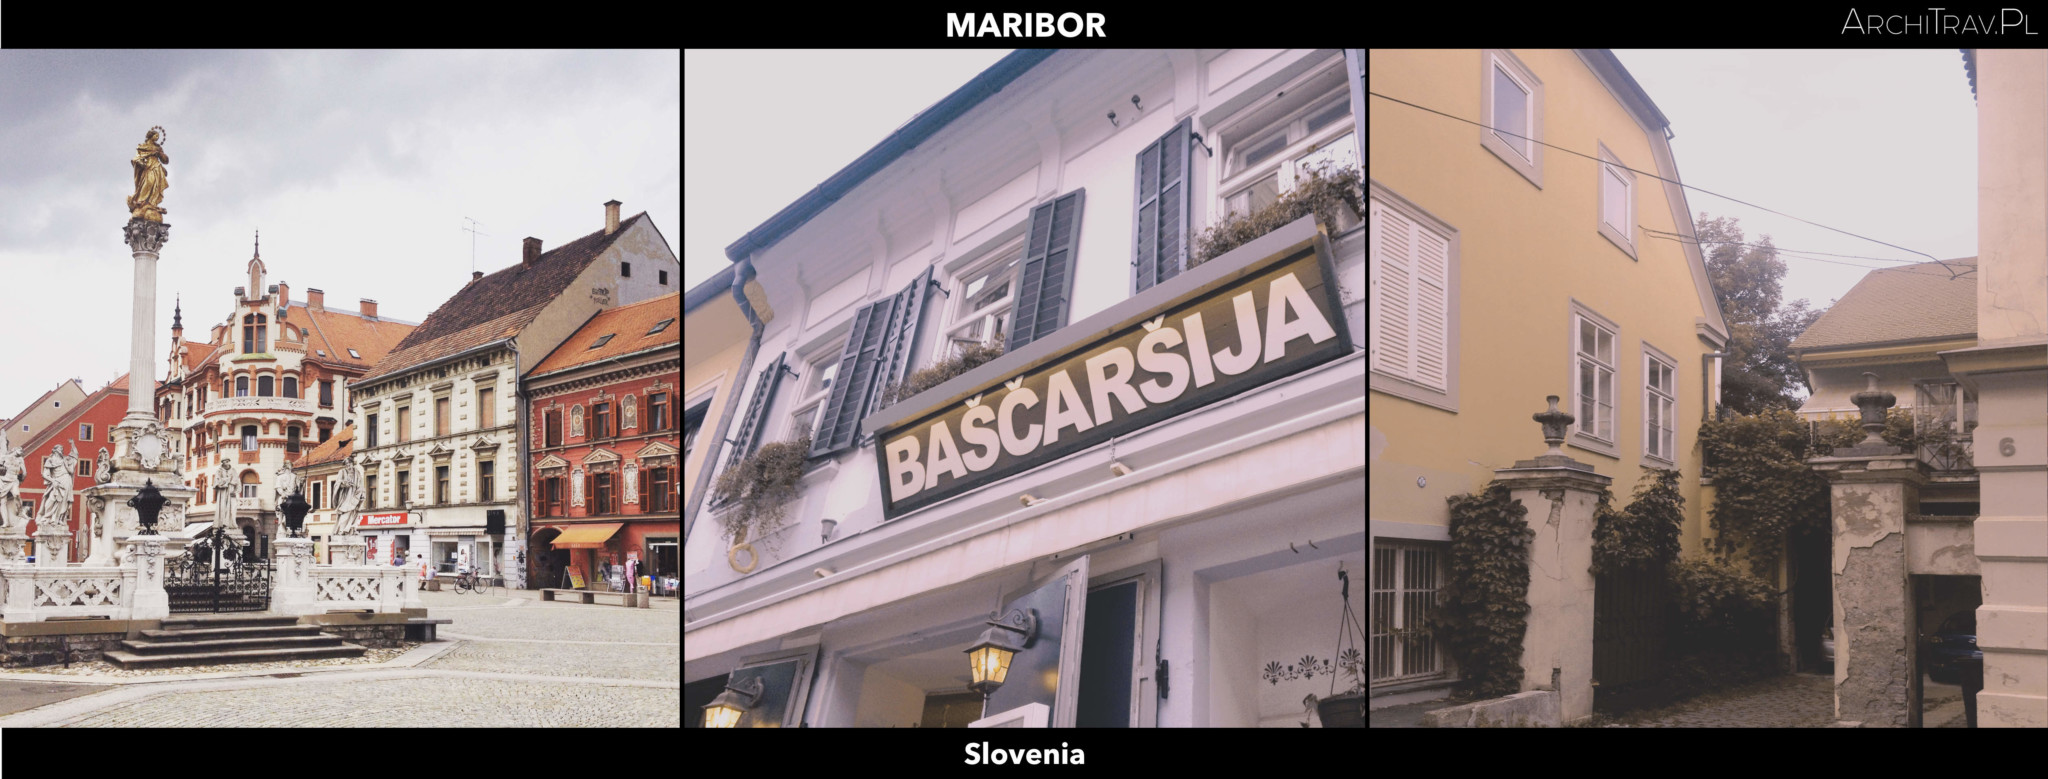 Slowenia Maribor